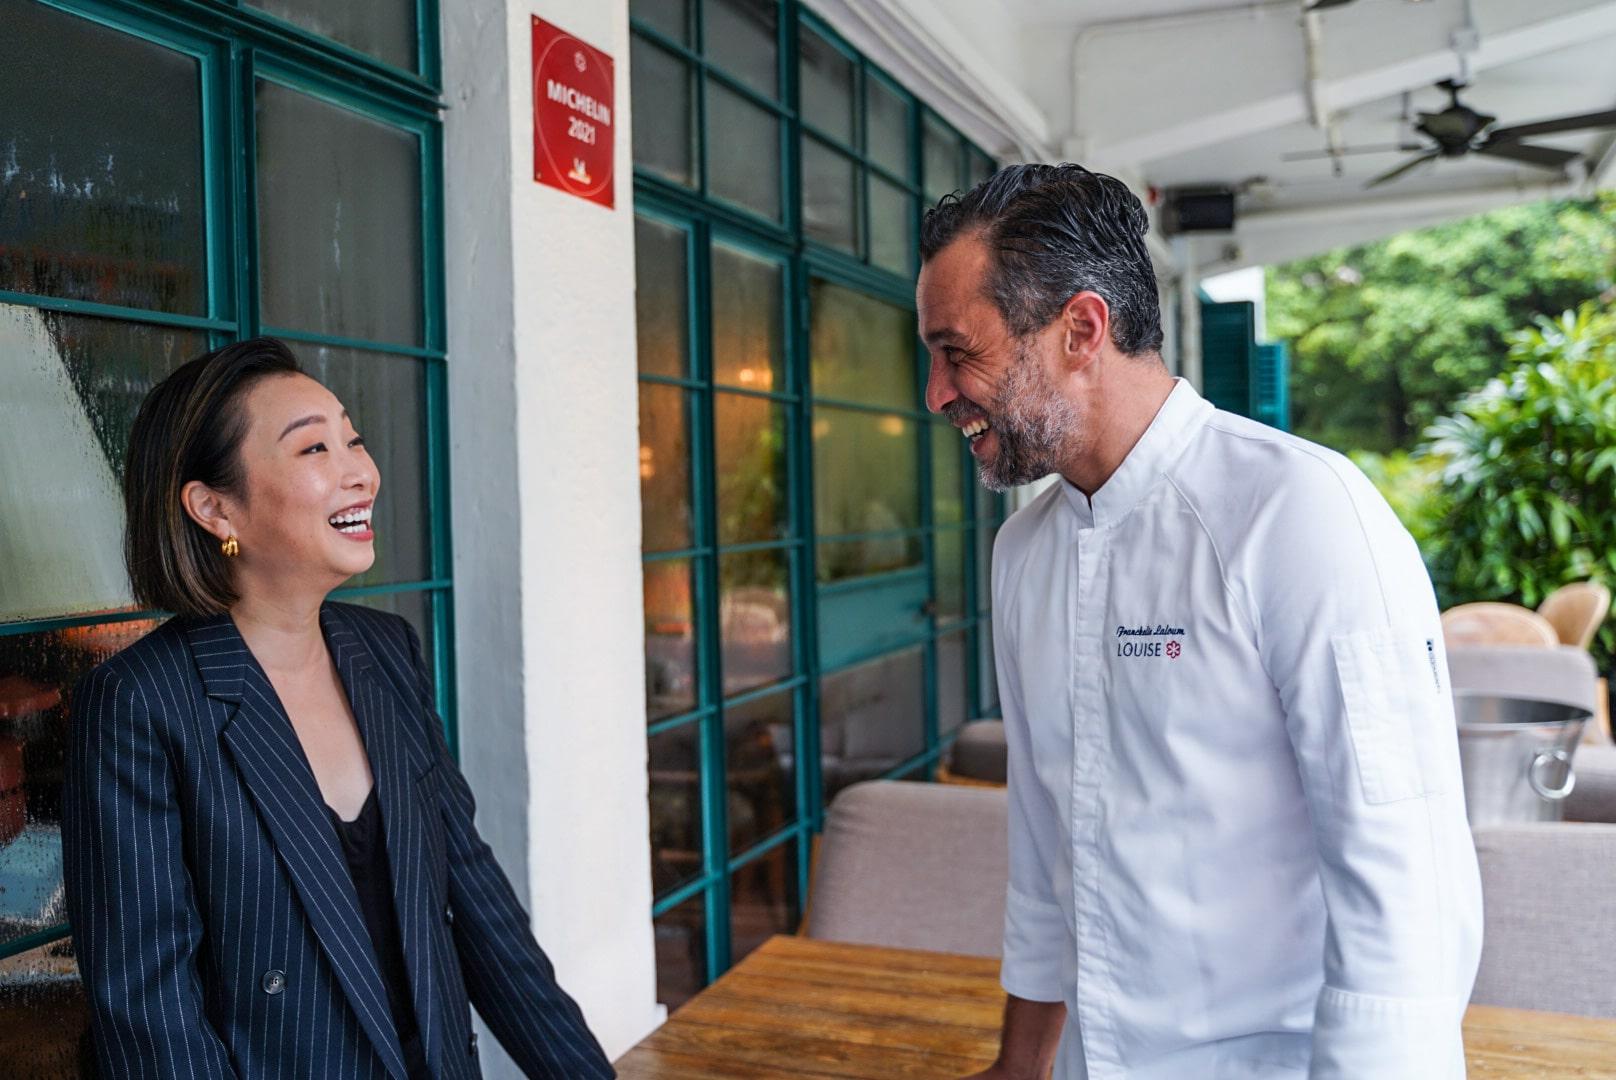 黃佩茵(Yenn Wong)和 Louise 行政總廚 Franckelie Laloum(相片:Pearl Yan)